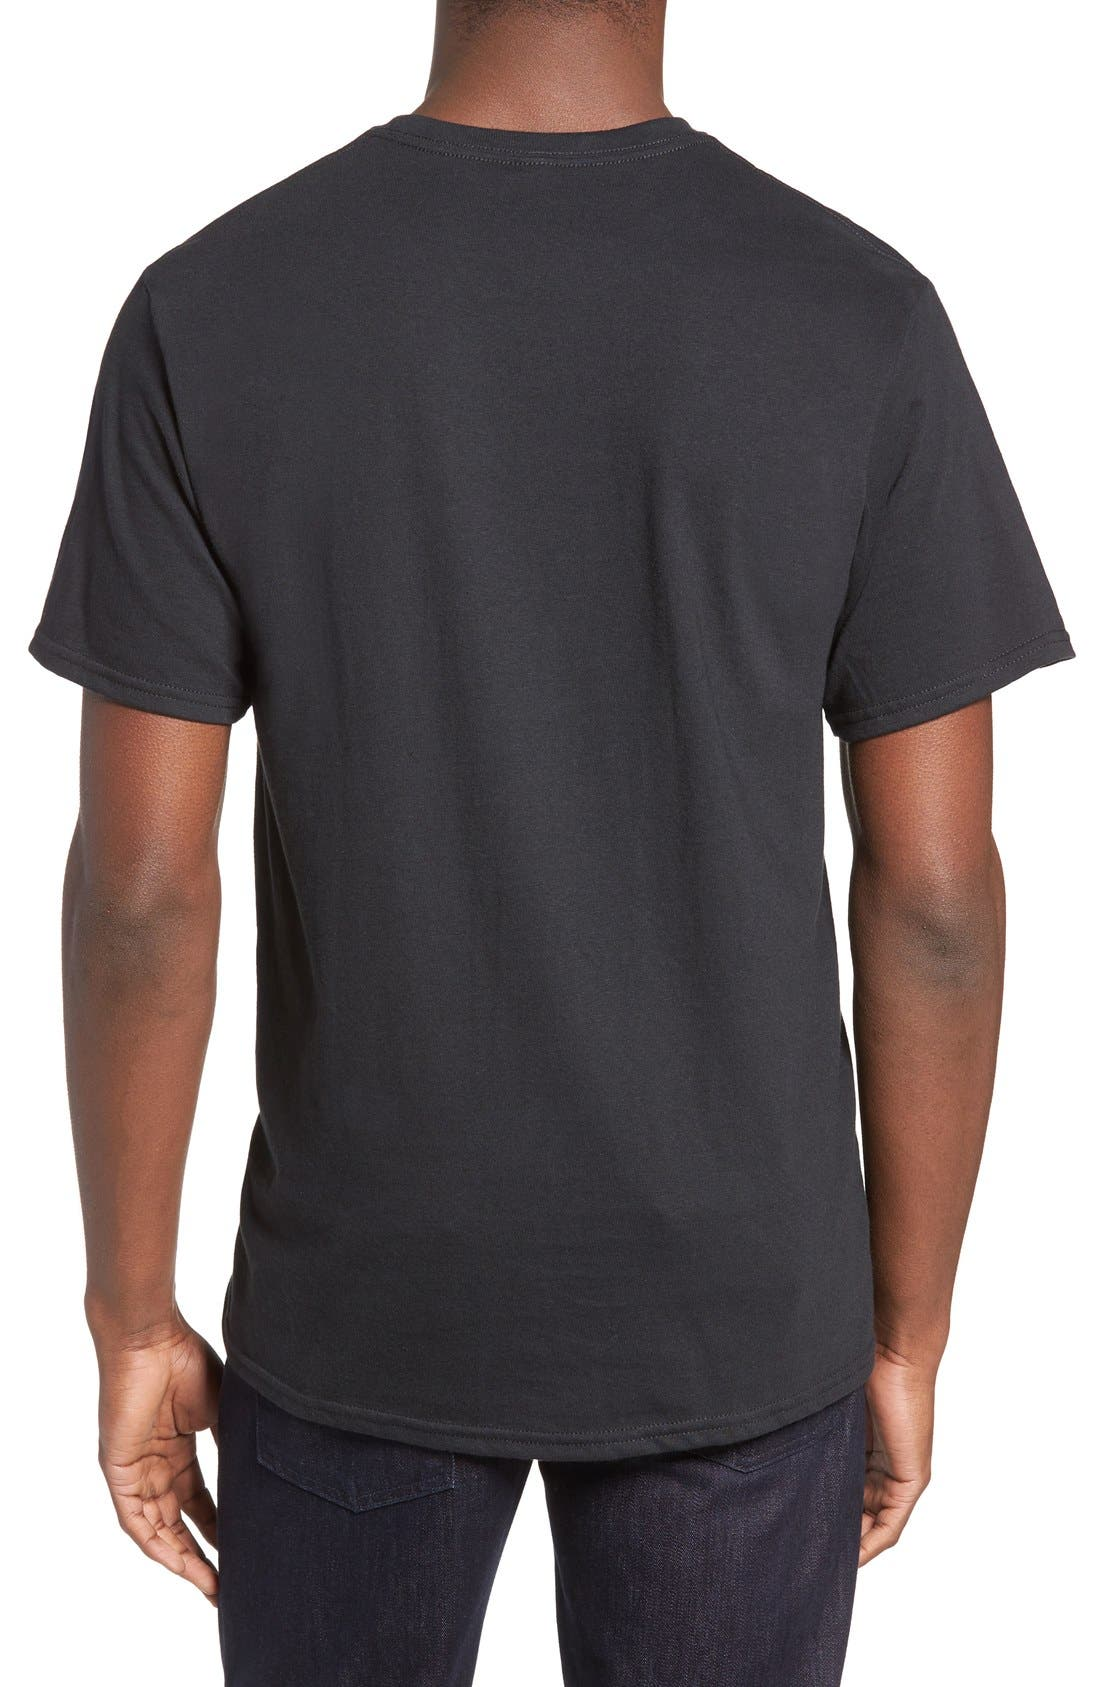 USA Graphic T-Shirt,                             Alternate thumbnail 2, color,                             Black